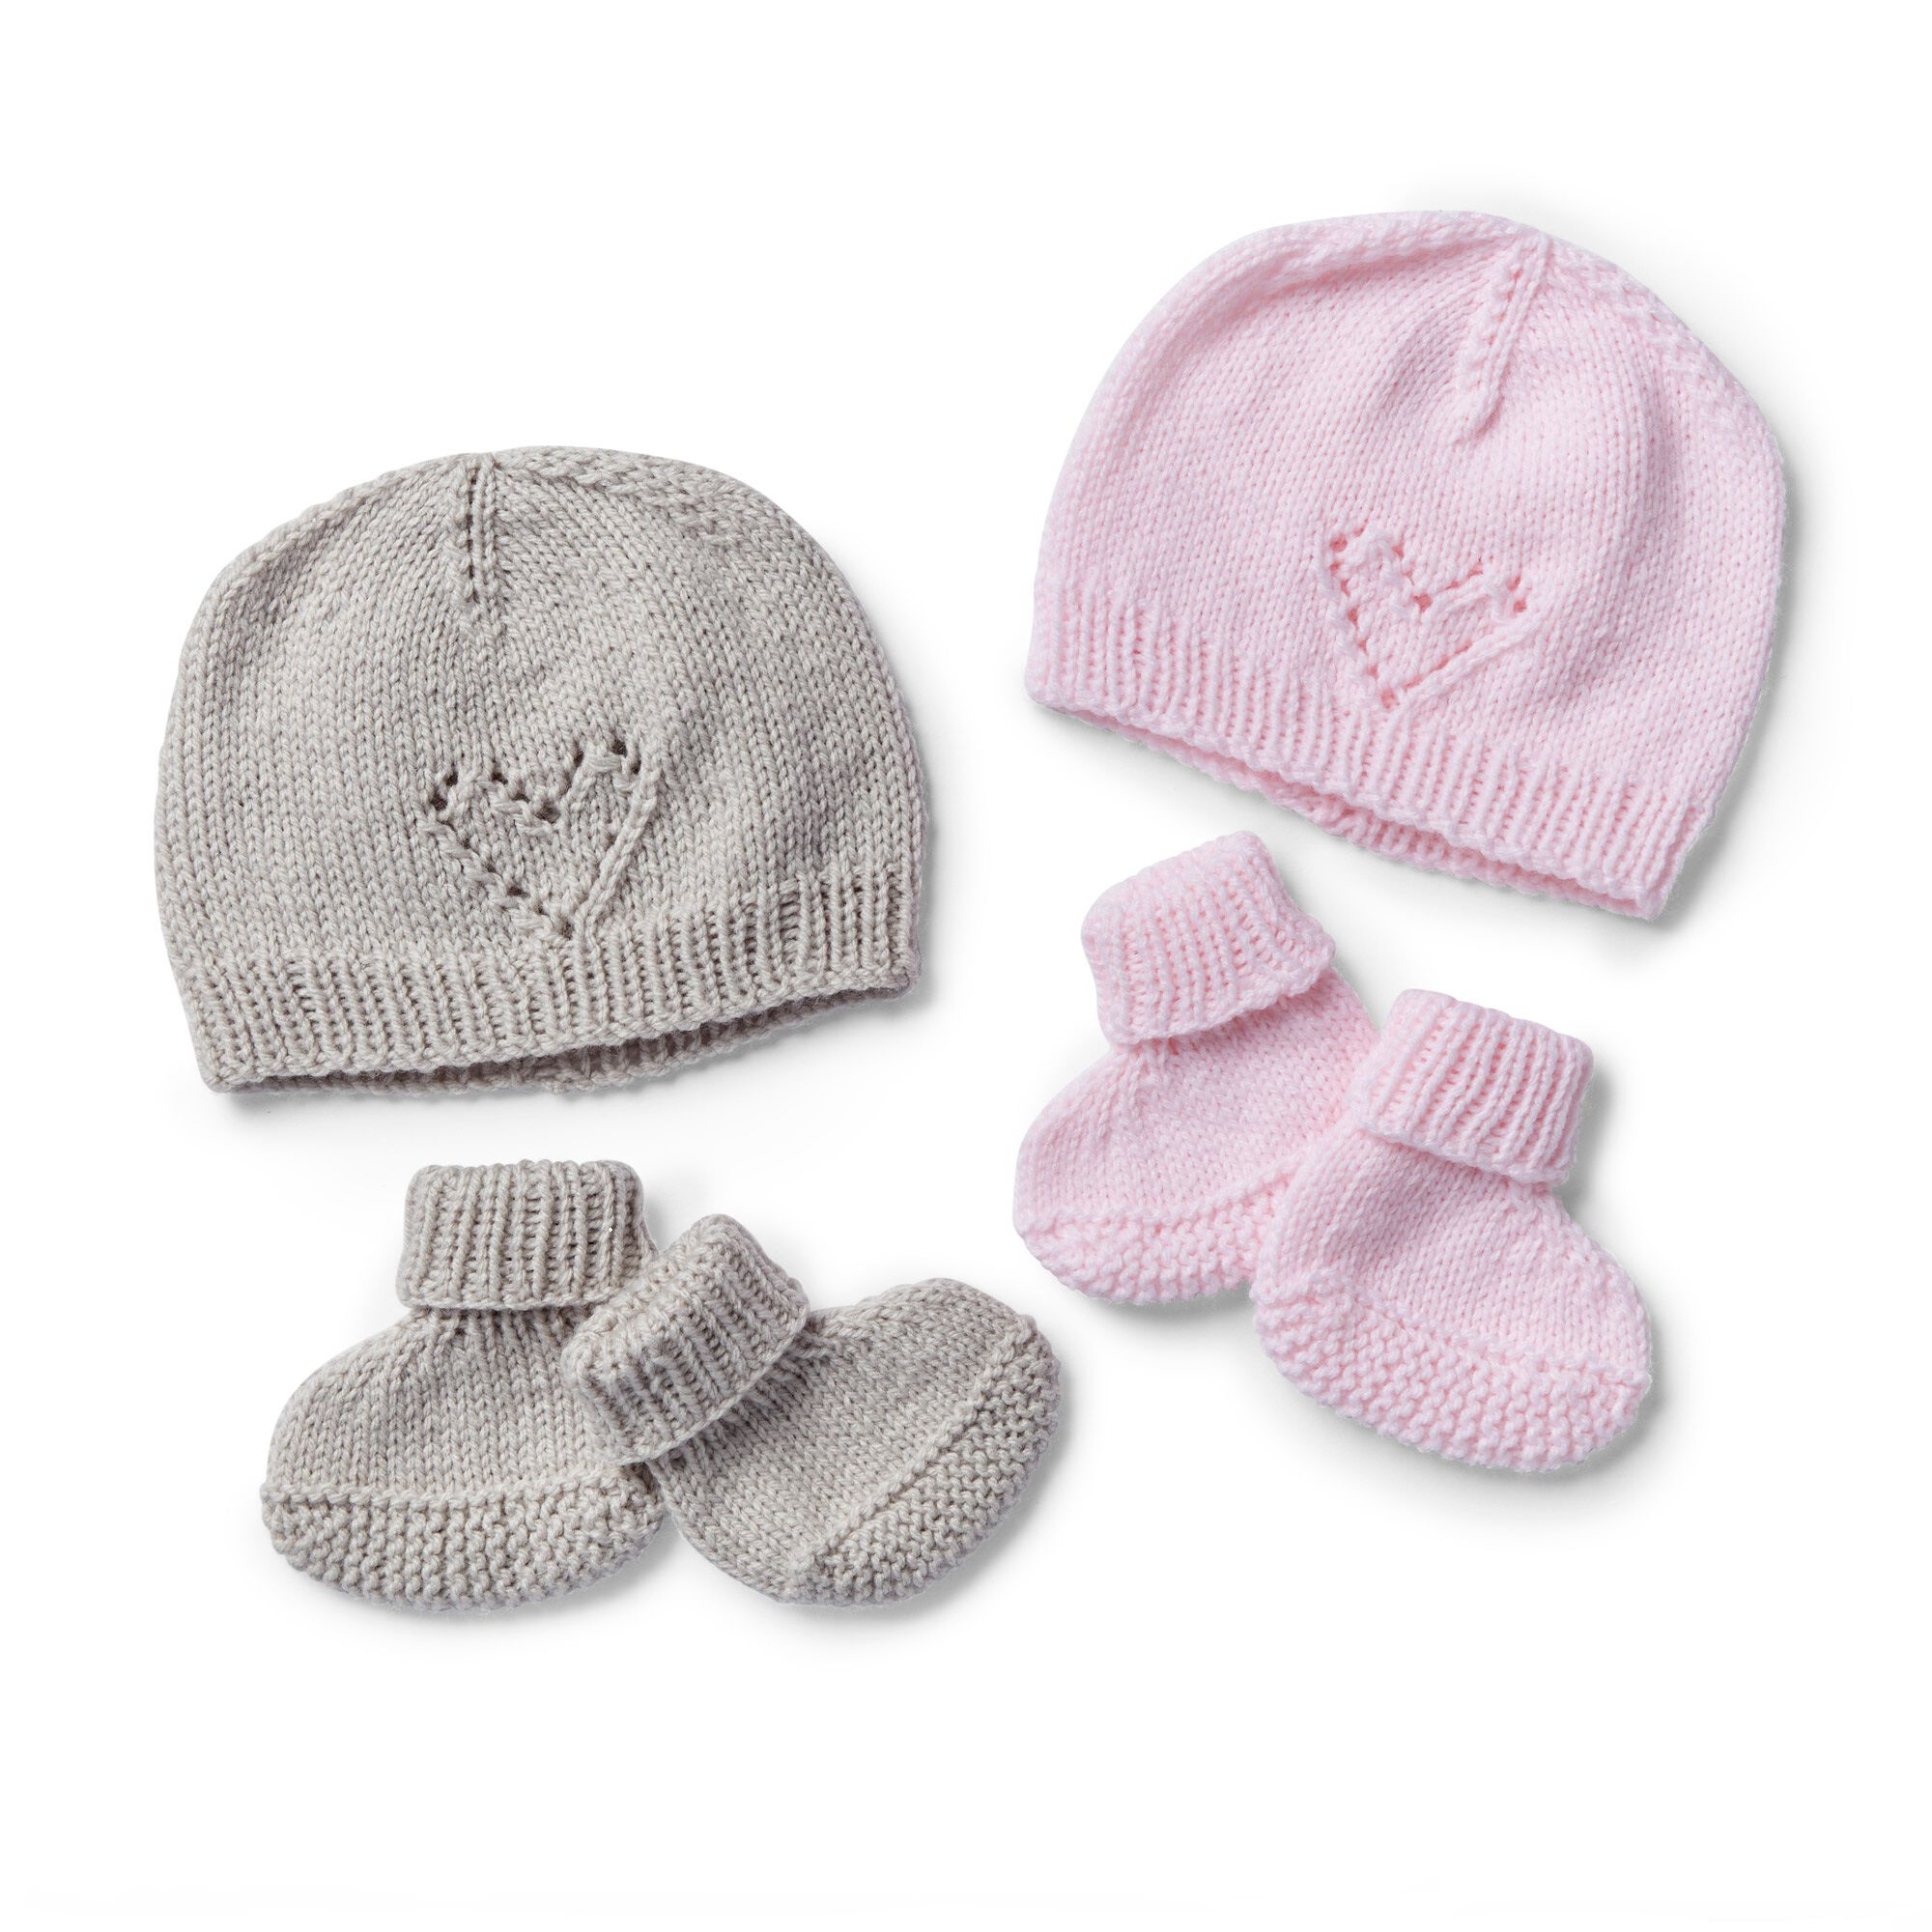 Bernat Cutie Booties And Cap To Knit Pattern Yarnspirations